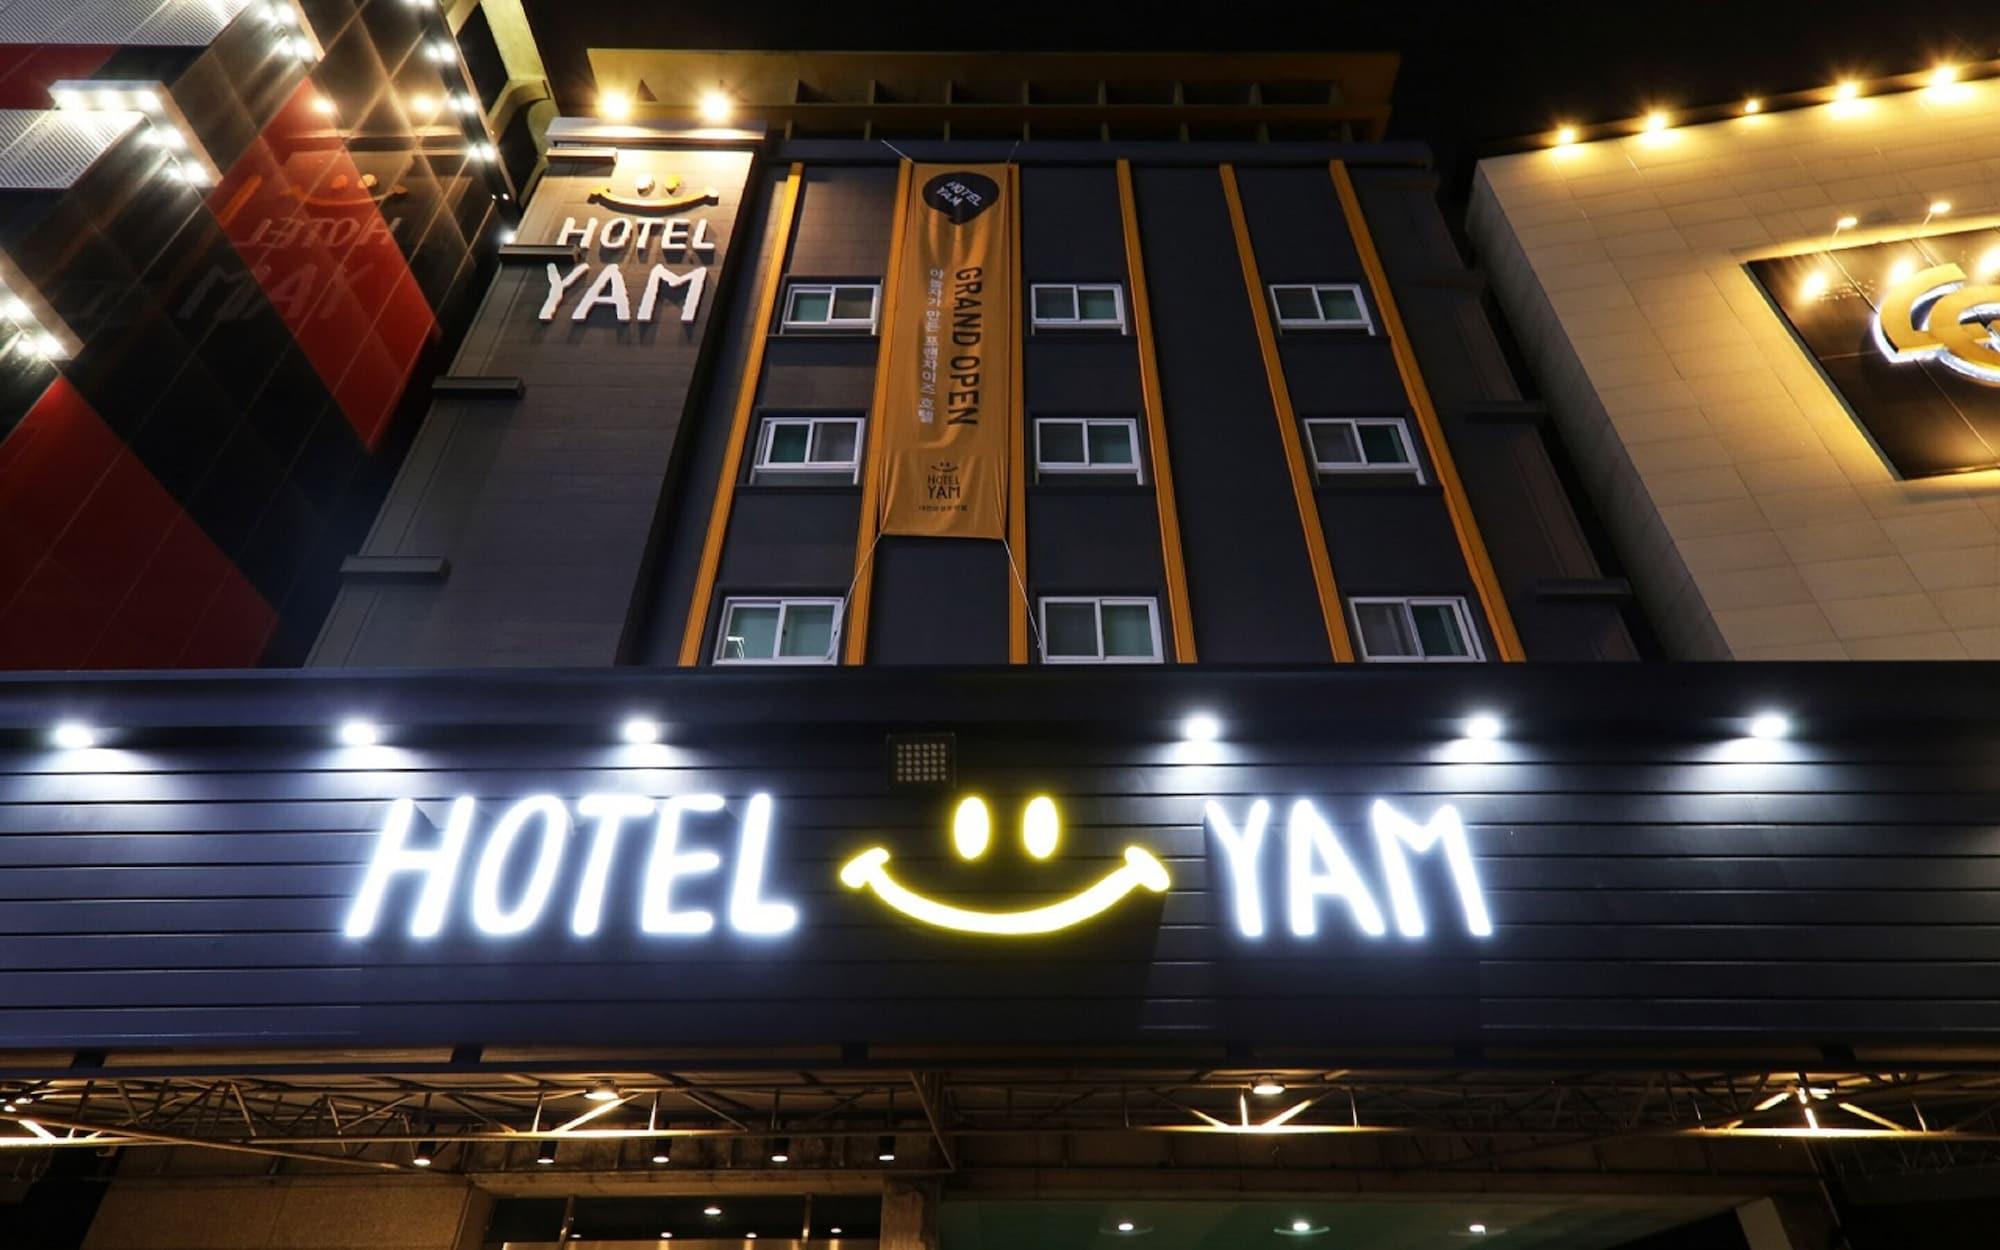 Hotel Yam Yuseong Oncheon, Yuseong